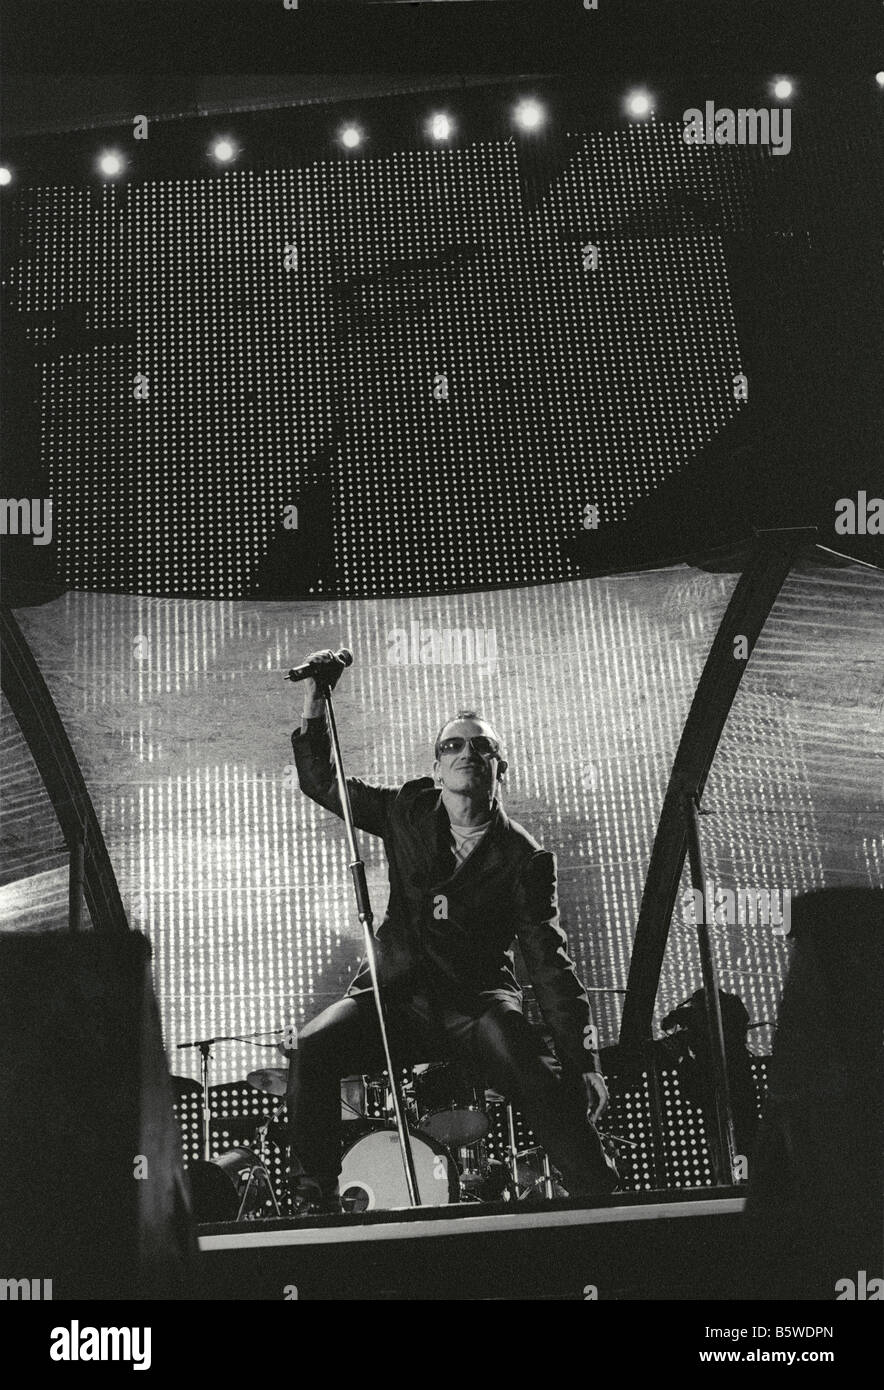 BONO - U2 - Stock Image